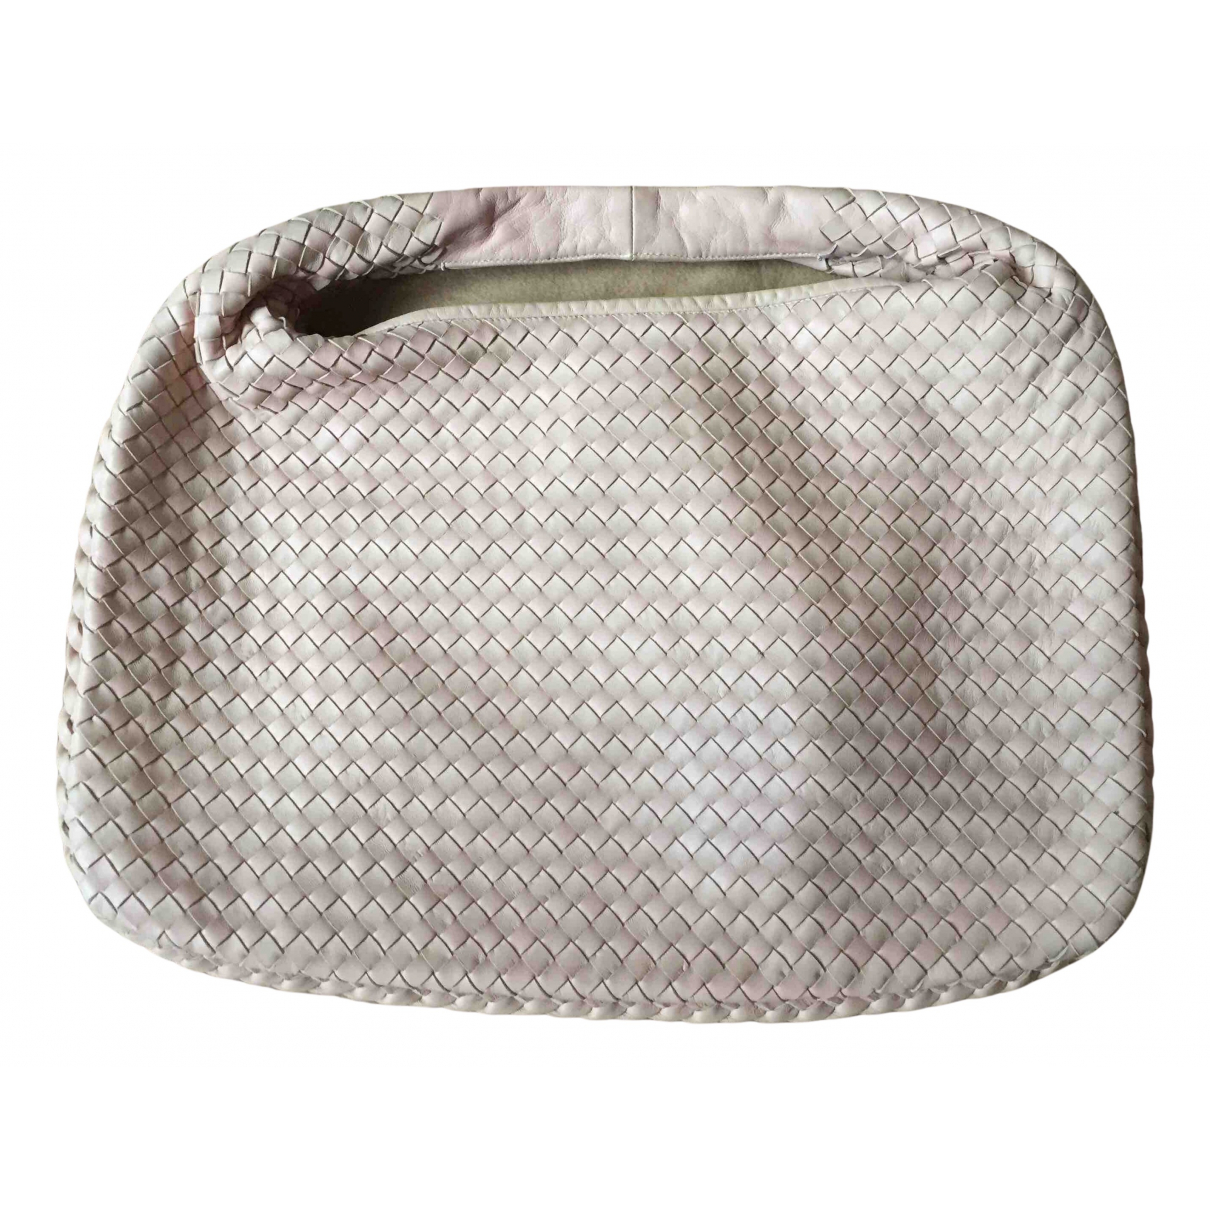 Bottega Veneta Veneta Leather handbag for Women N